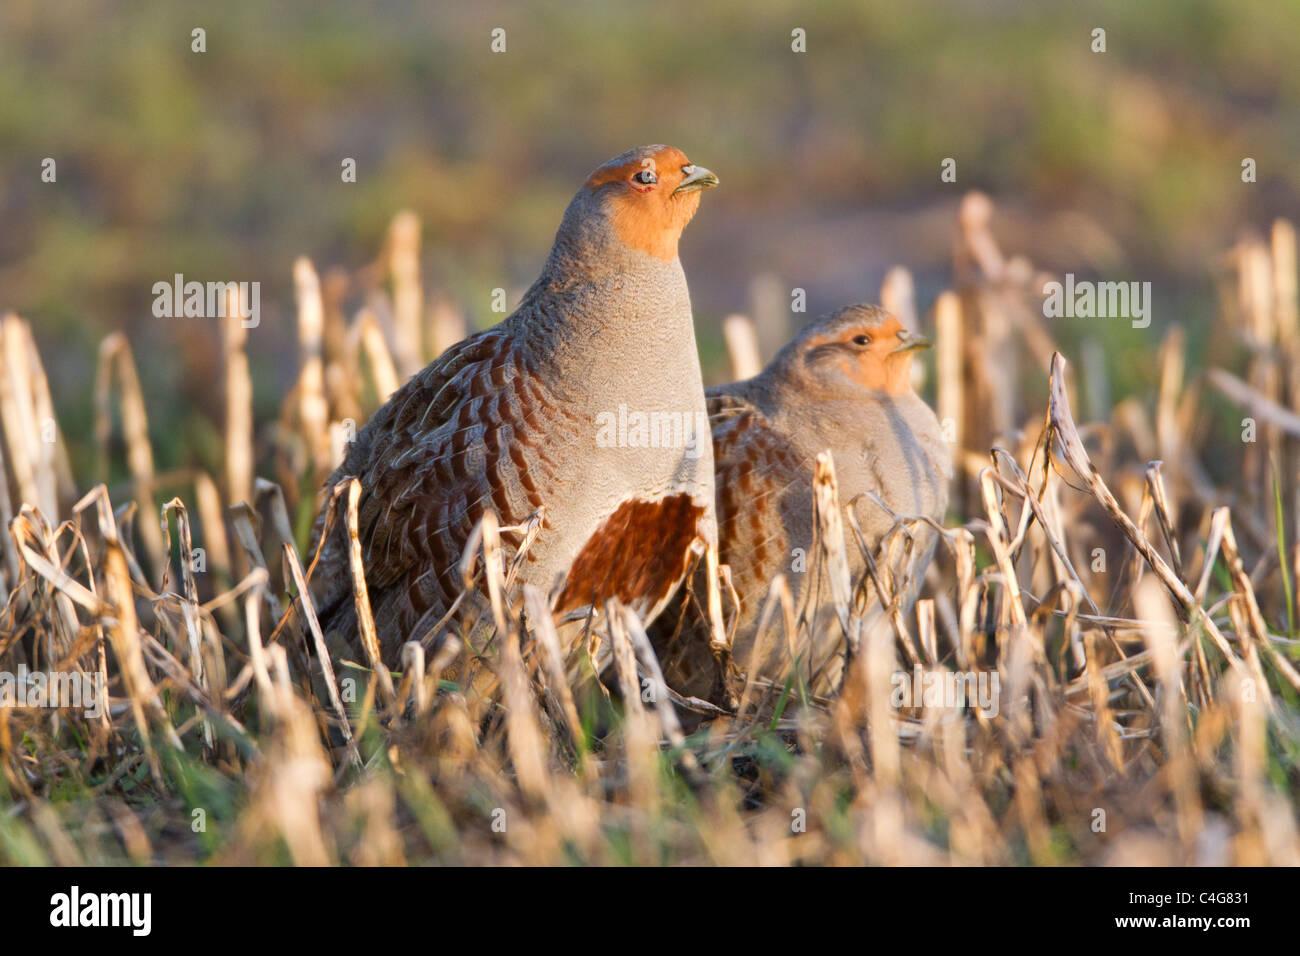 Grey Partridge (Perdix perdix), pair on field of stubble, Lower Saxony, Germany - Stock Image